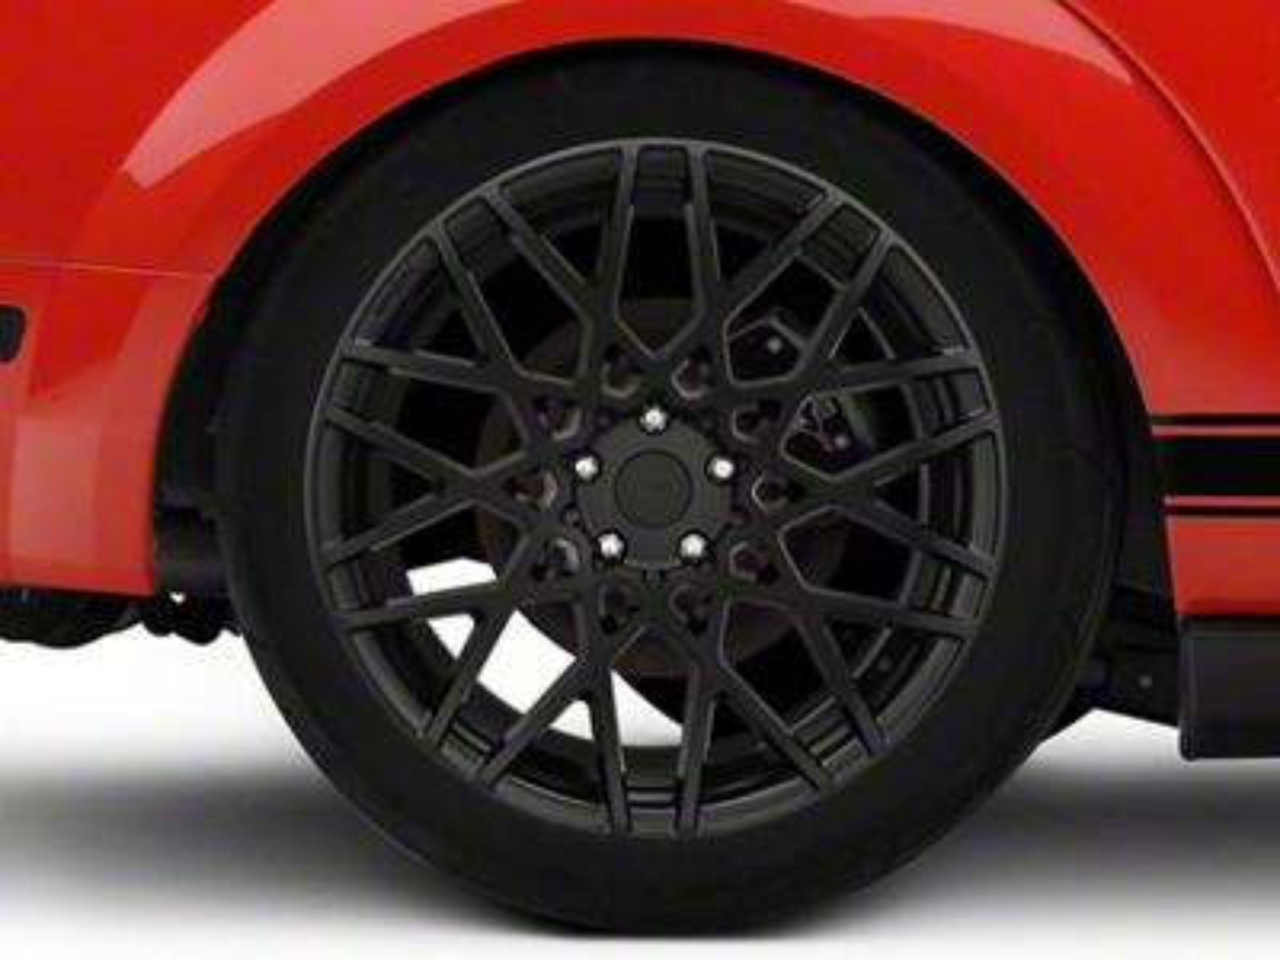 Rotiform BLQ Matte Black Wheel - 20x10 - Rear Only (05-14 All)